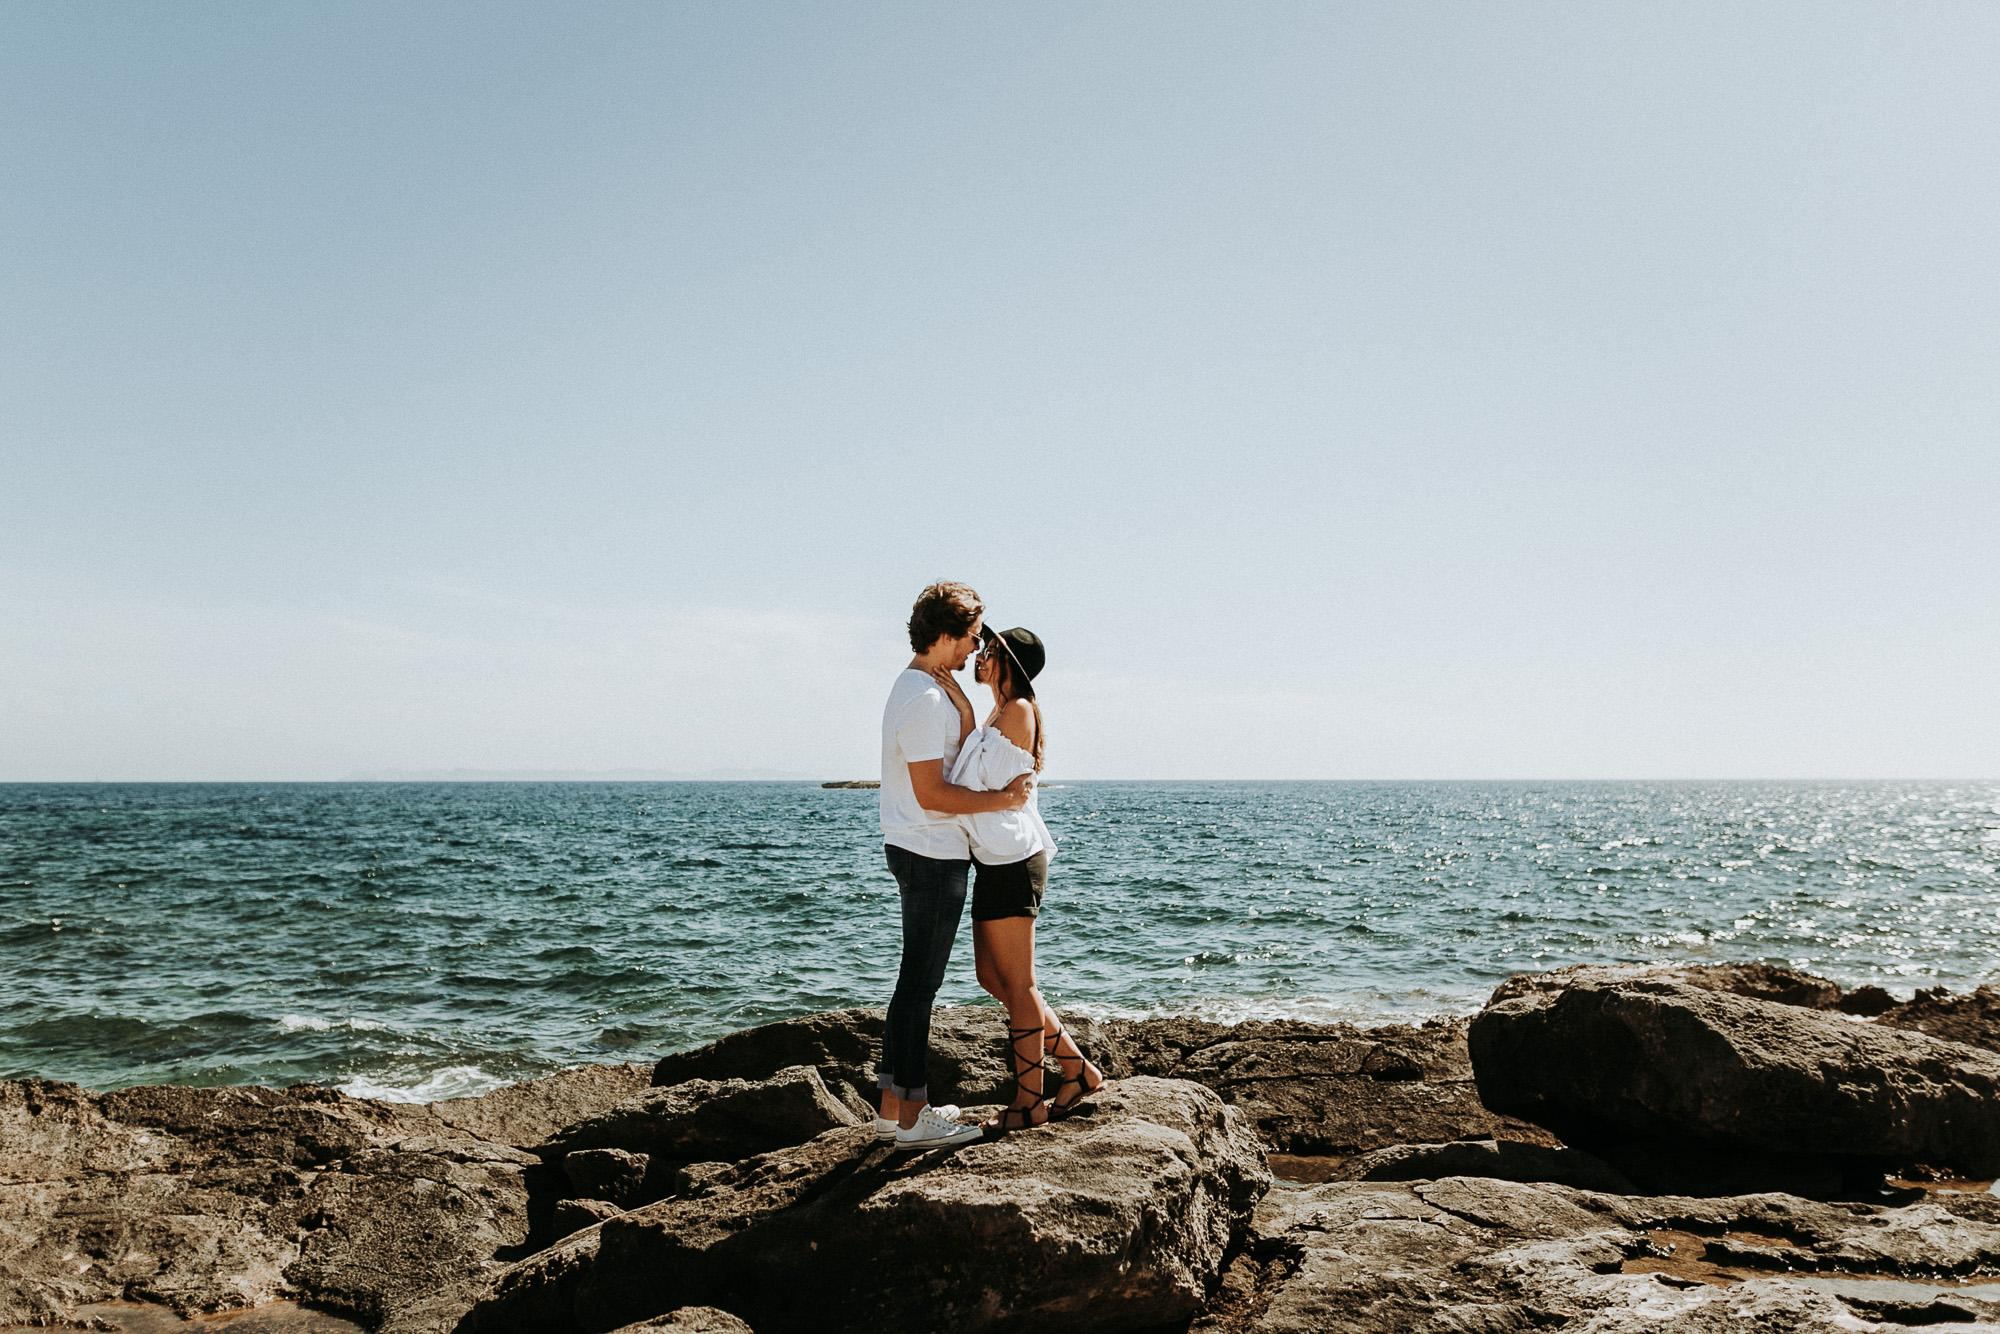 DanielaMarquardtPhotography_wedding_elopement_mallorca_spain_stjordi_sessalines_marinaandxavi72